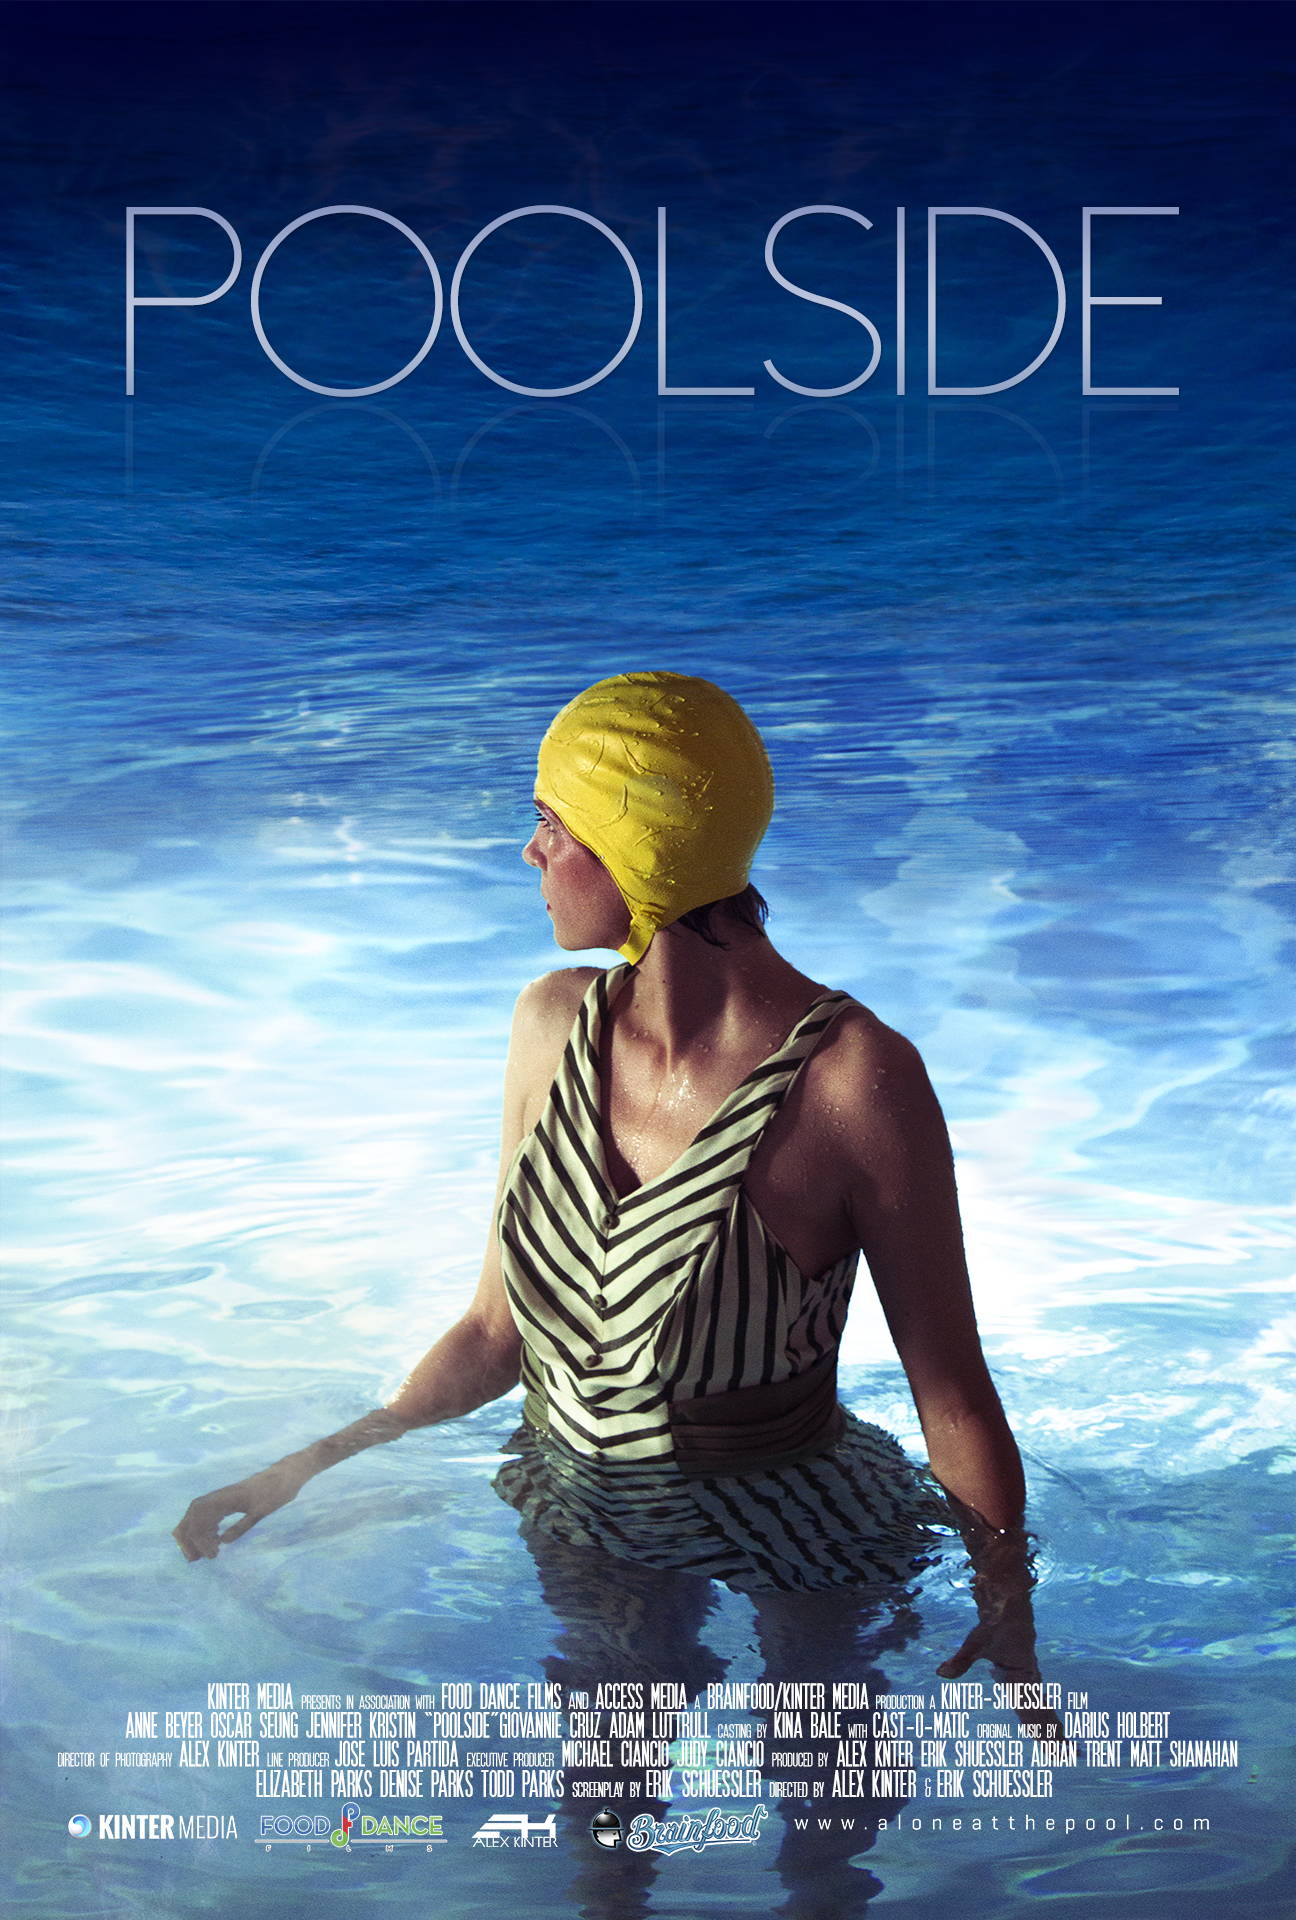 Dallas Film - Poolside | Alex Kinter